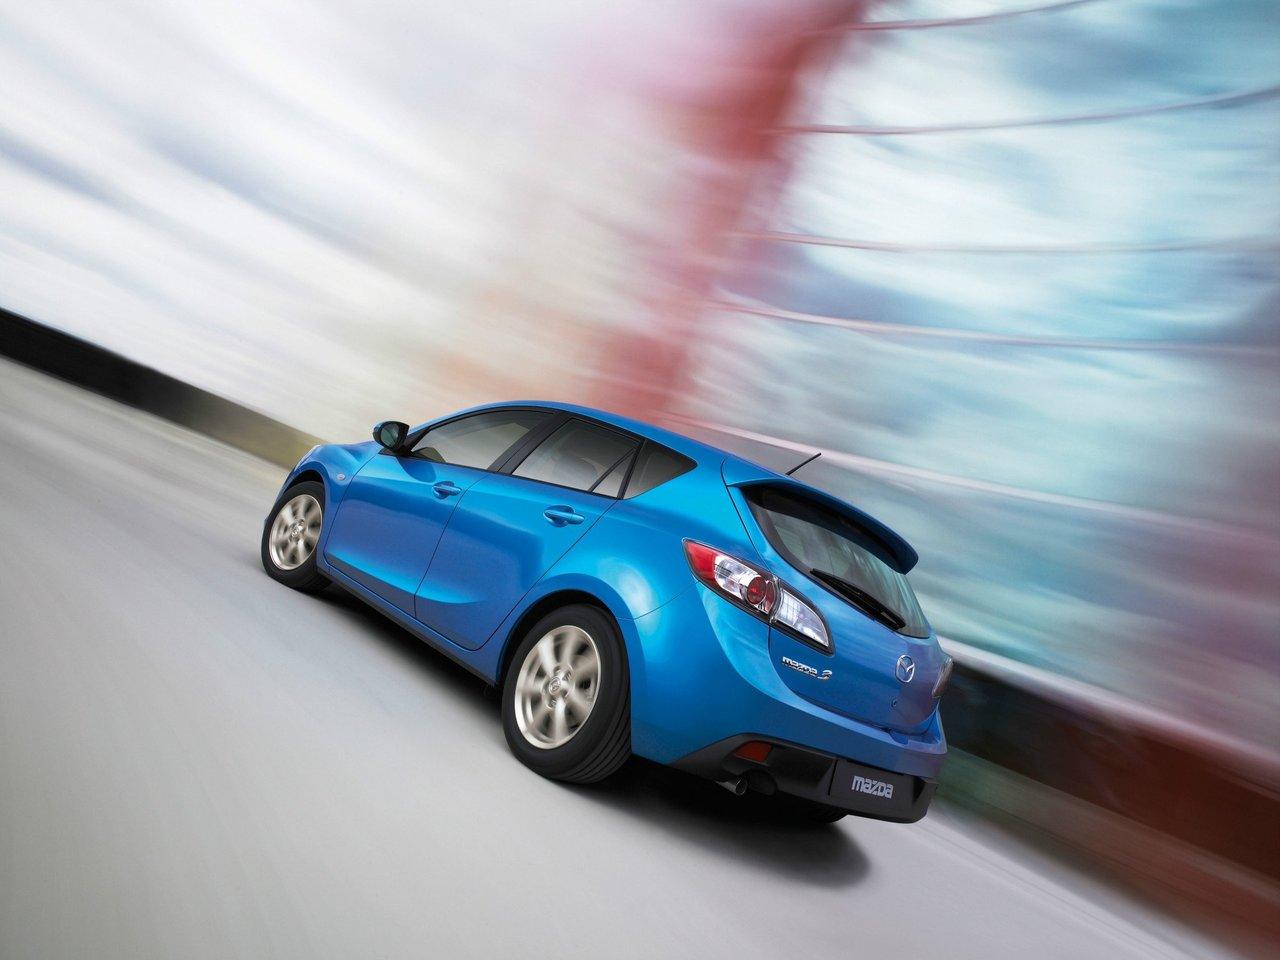 Снимки: Mazda Mazda 3 II